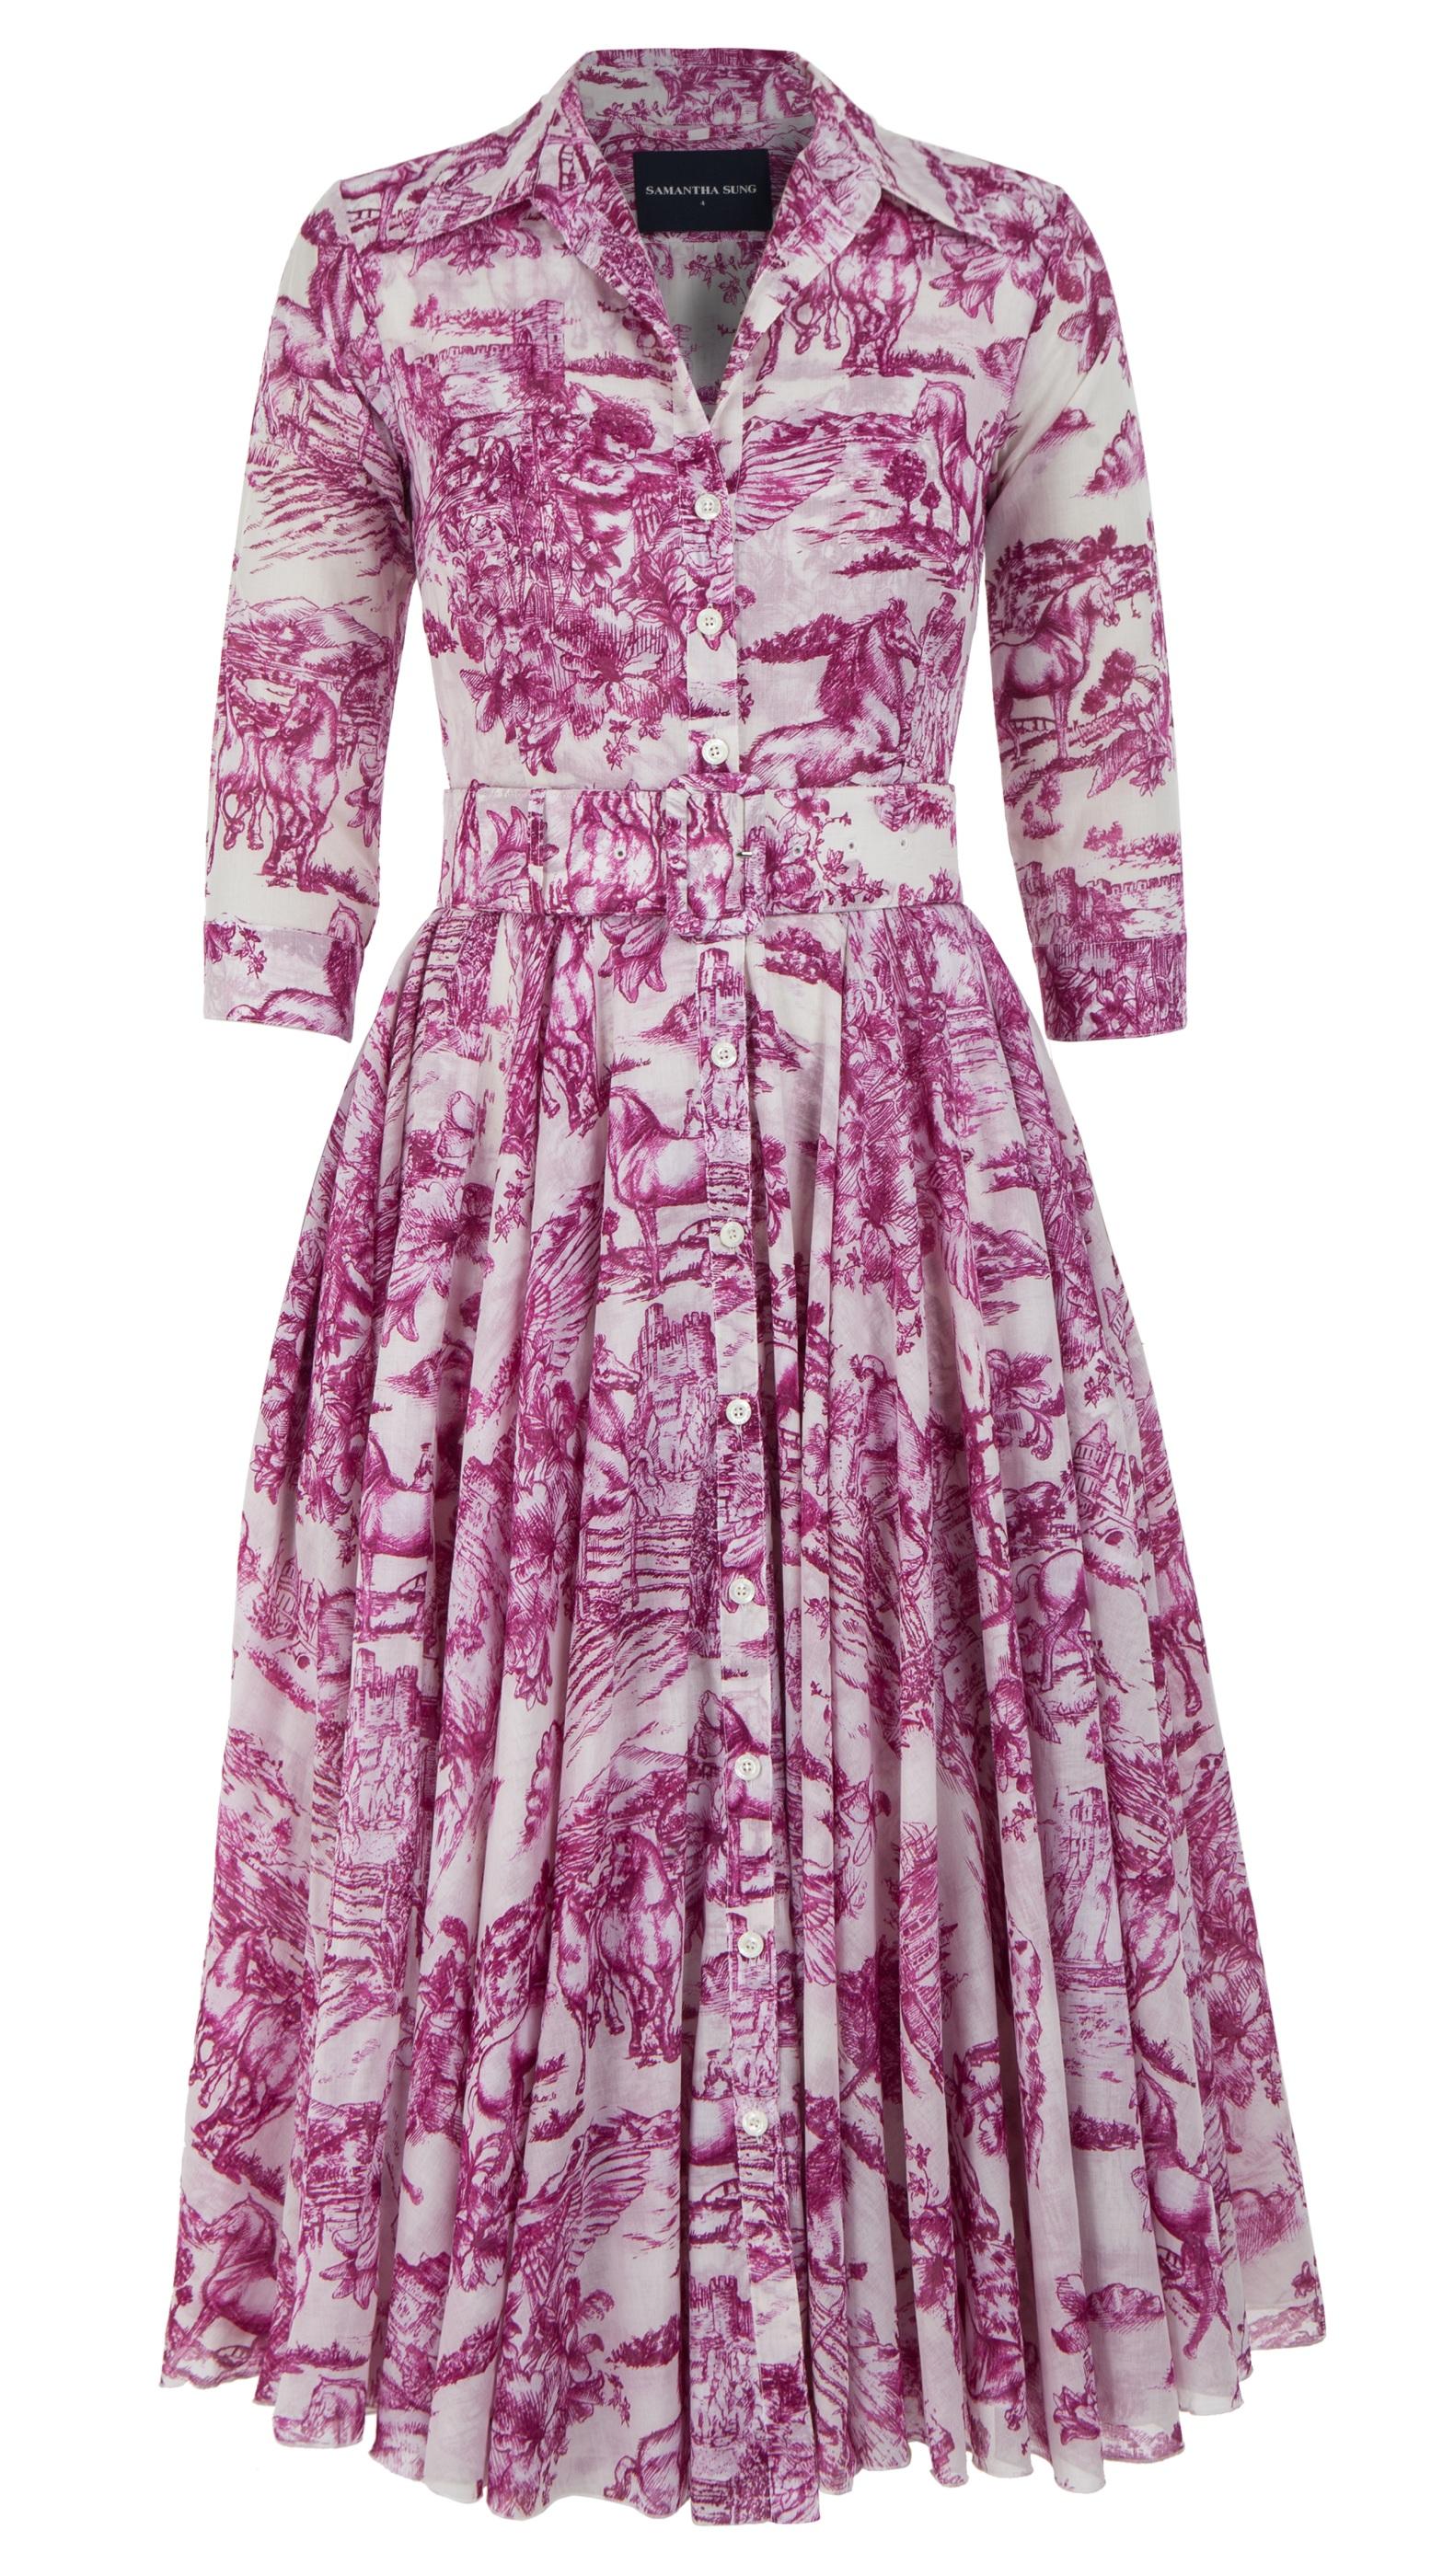 Da Vinci Toile White_White Pink_Aster Dress Shirt Collar 3-4 Sleeve_Midi_Musola_Front-2